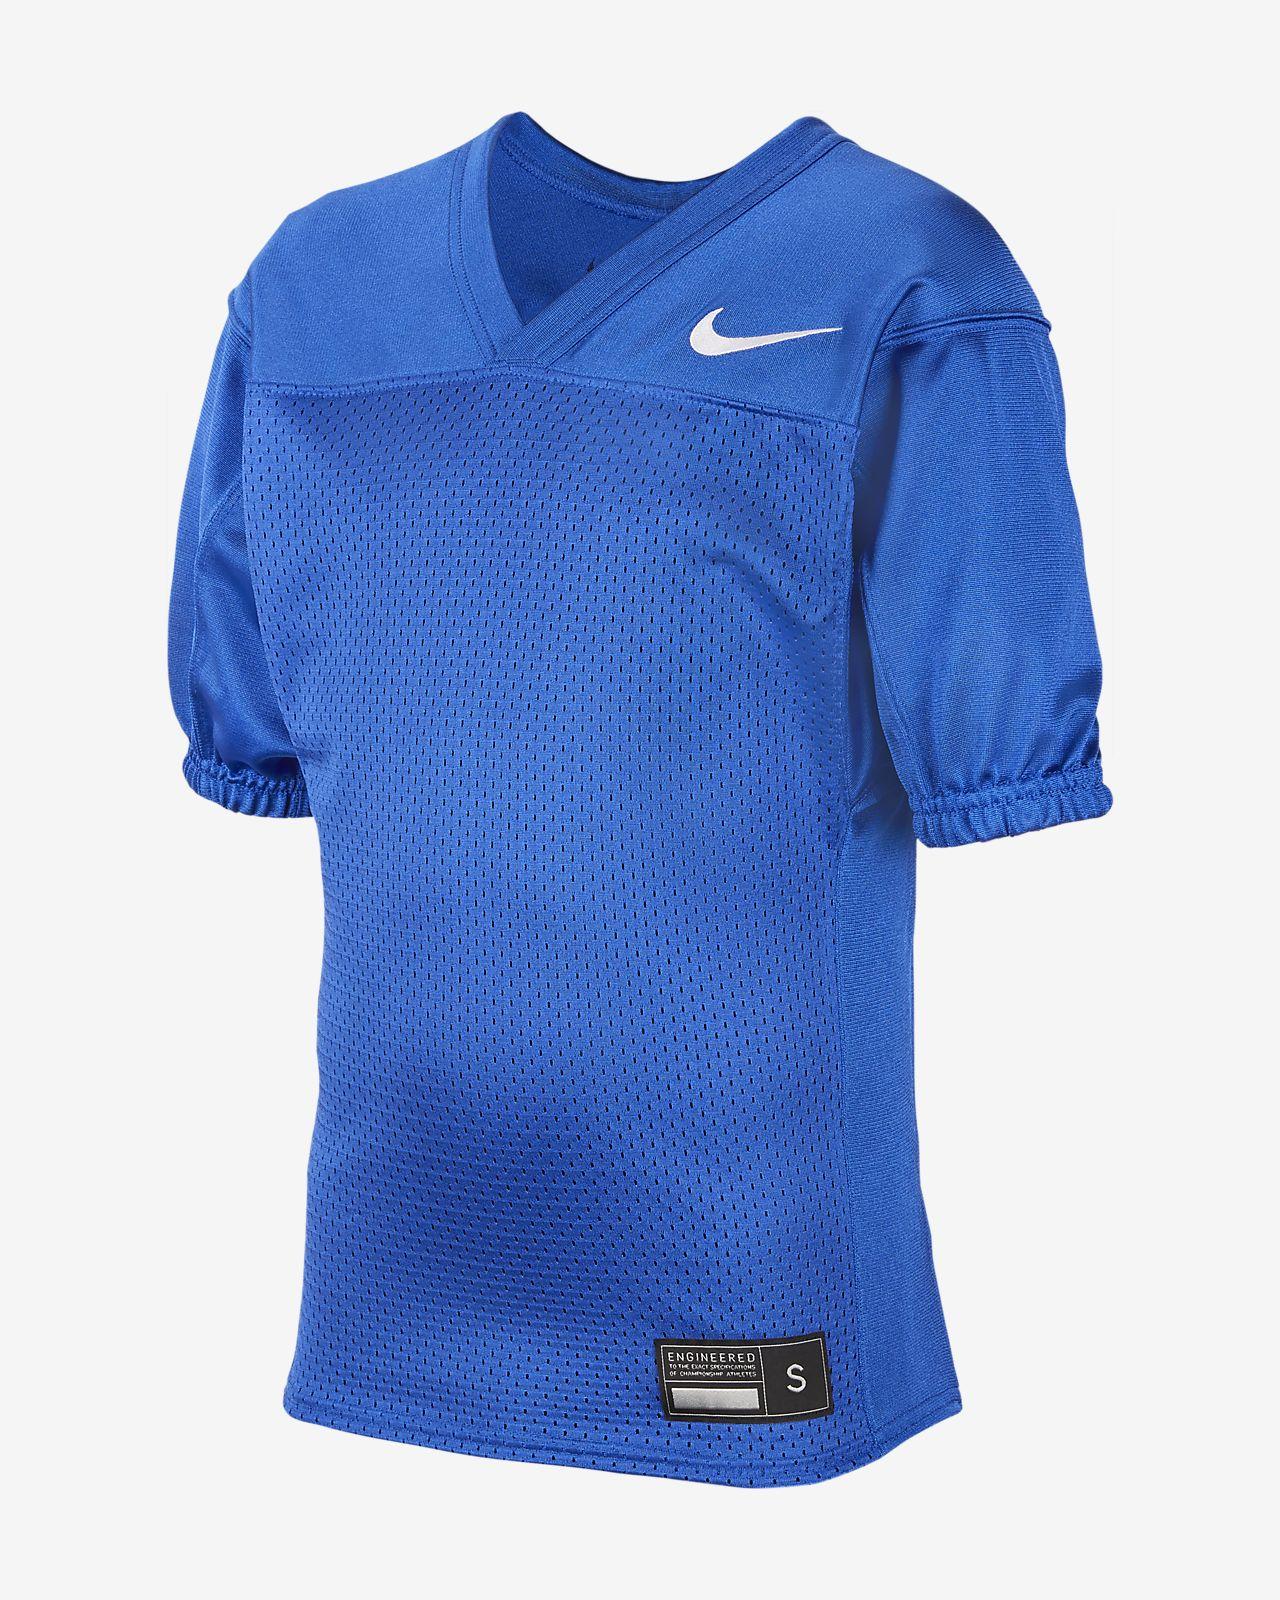 Nike Practice Big Kids' (Boys') Football Jersey